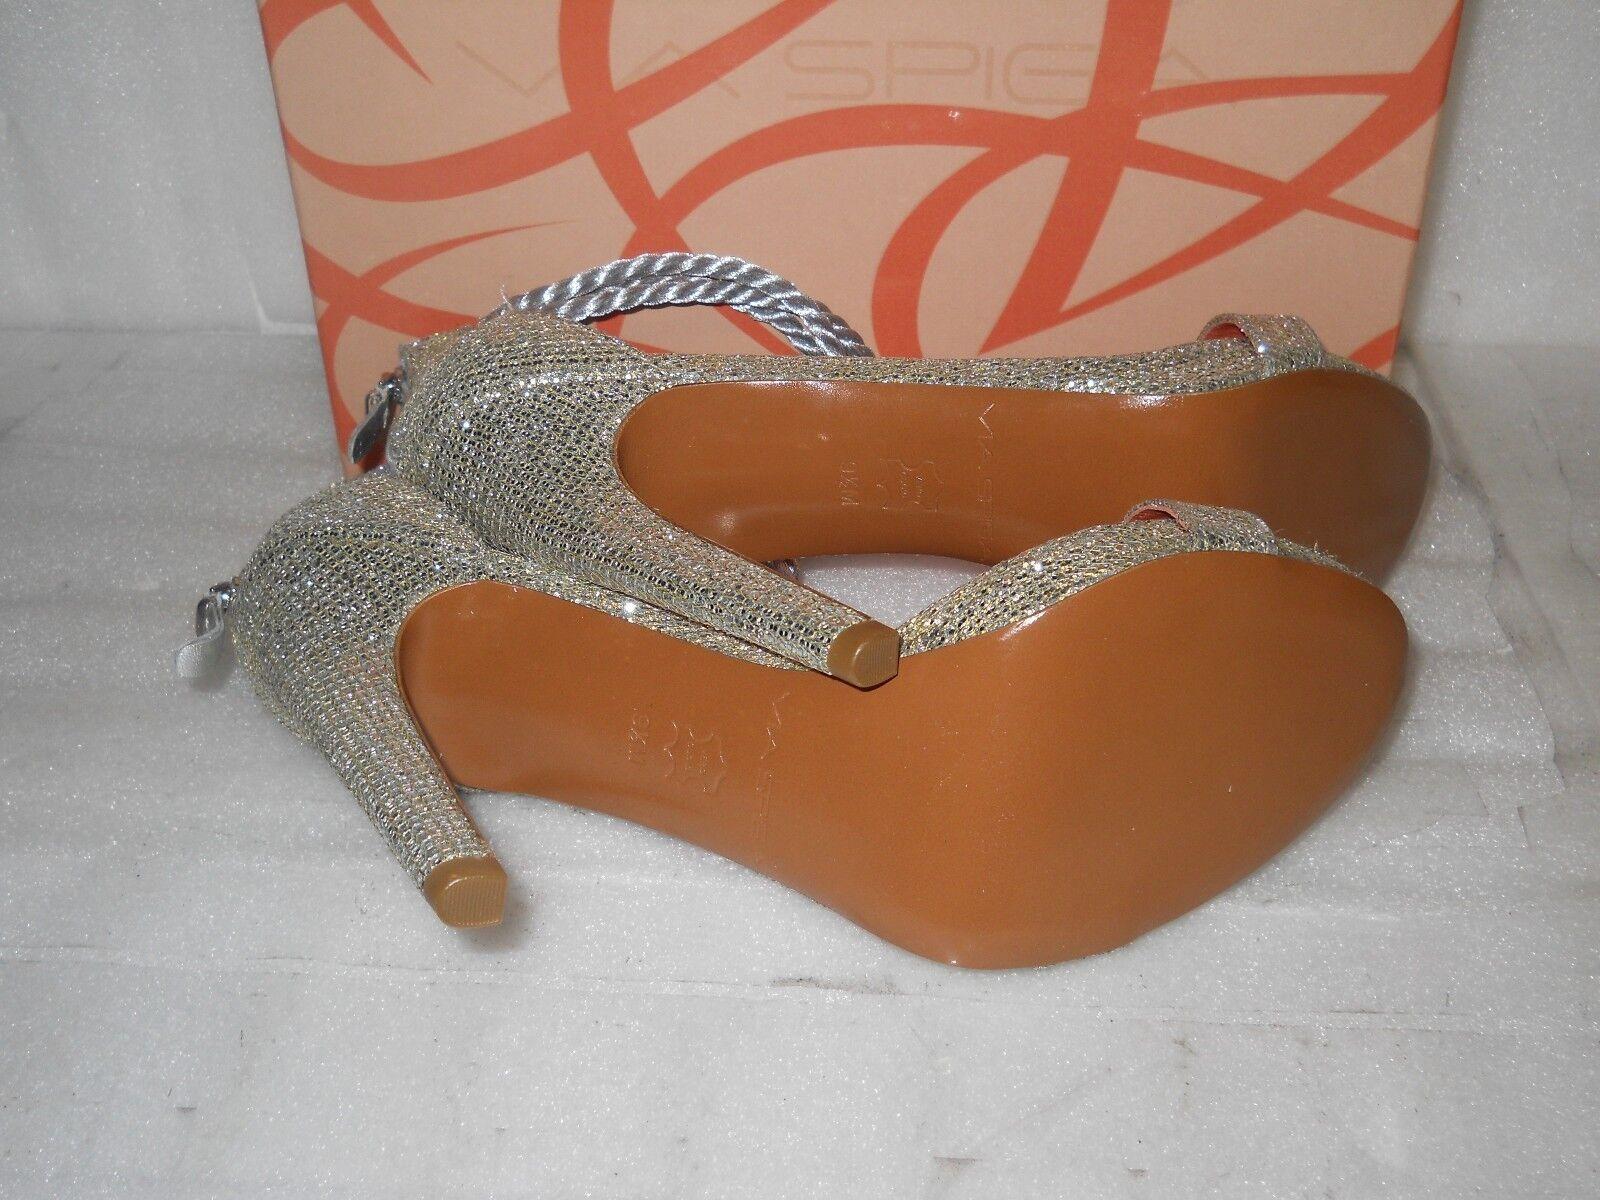 Via Spiga New Damenschuhe Penelope Silver Glitter Heels Heels Glitter 8.5 M Schuhes NWB ce9318